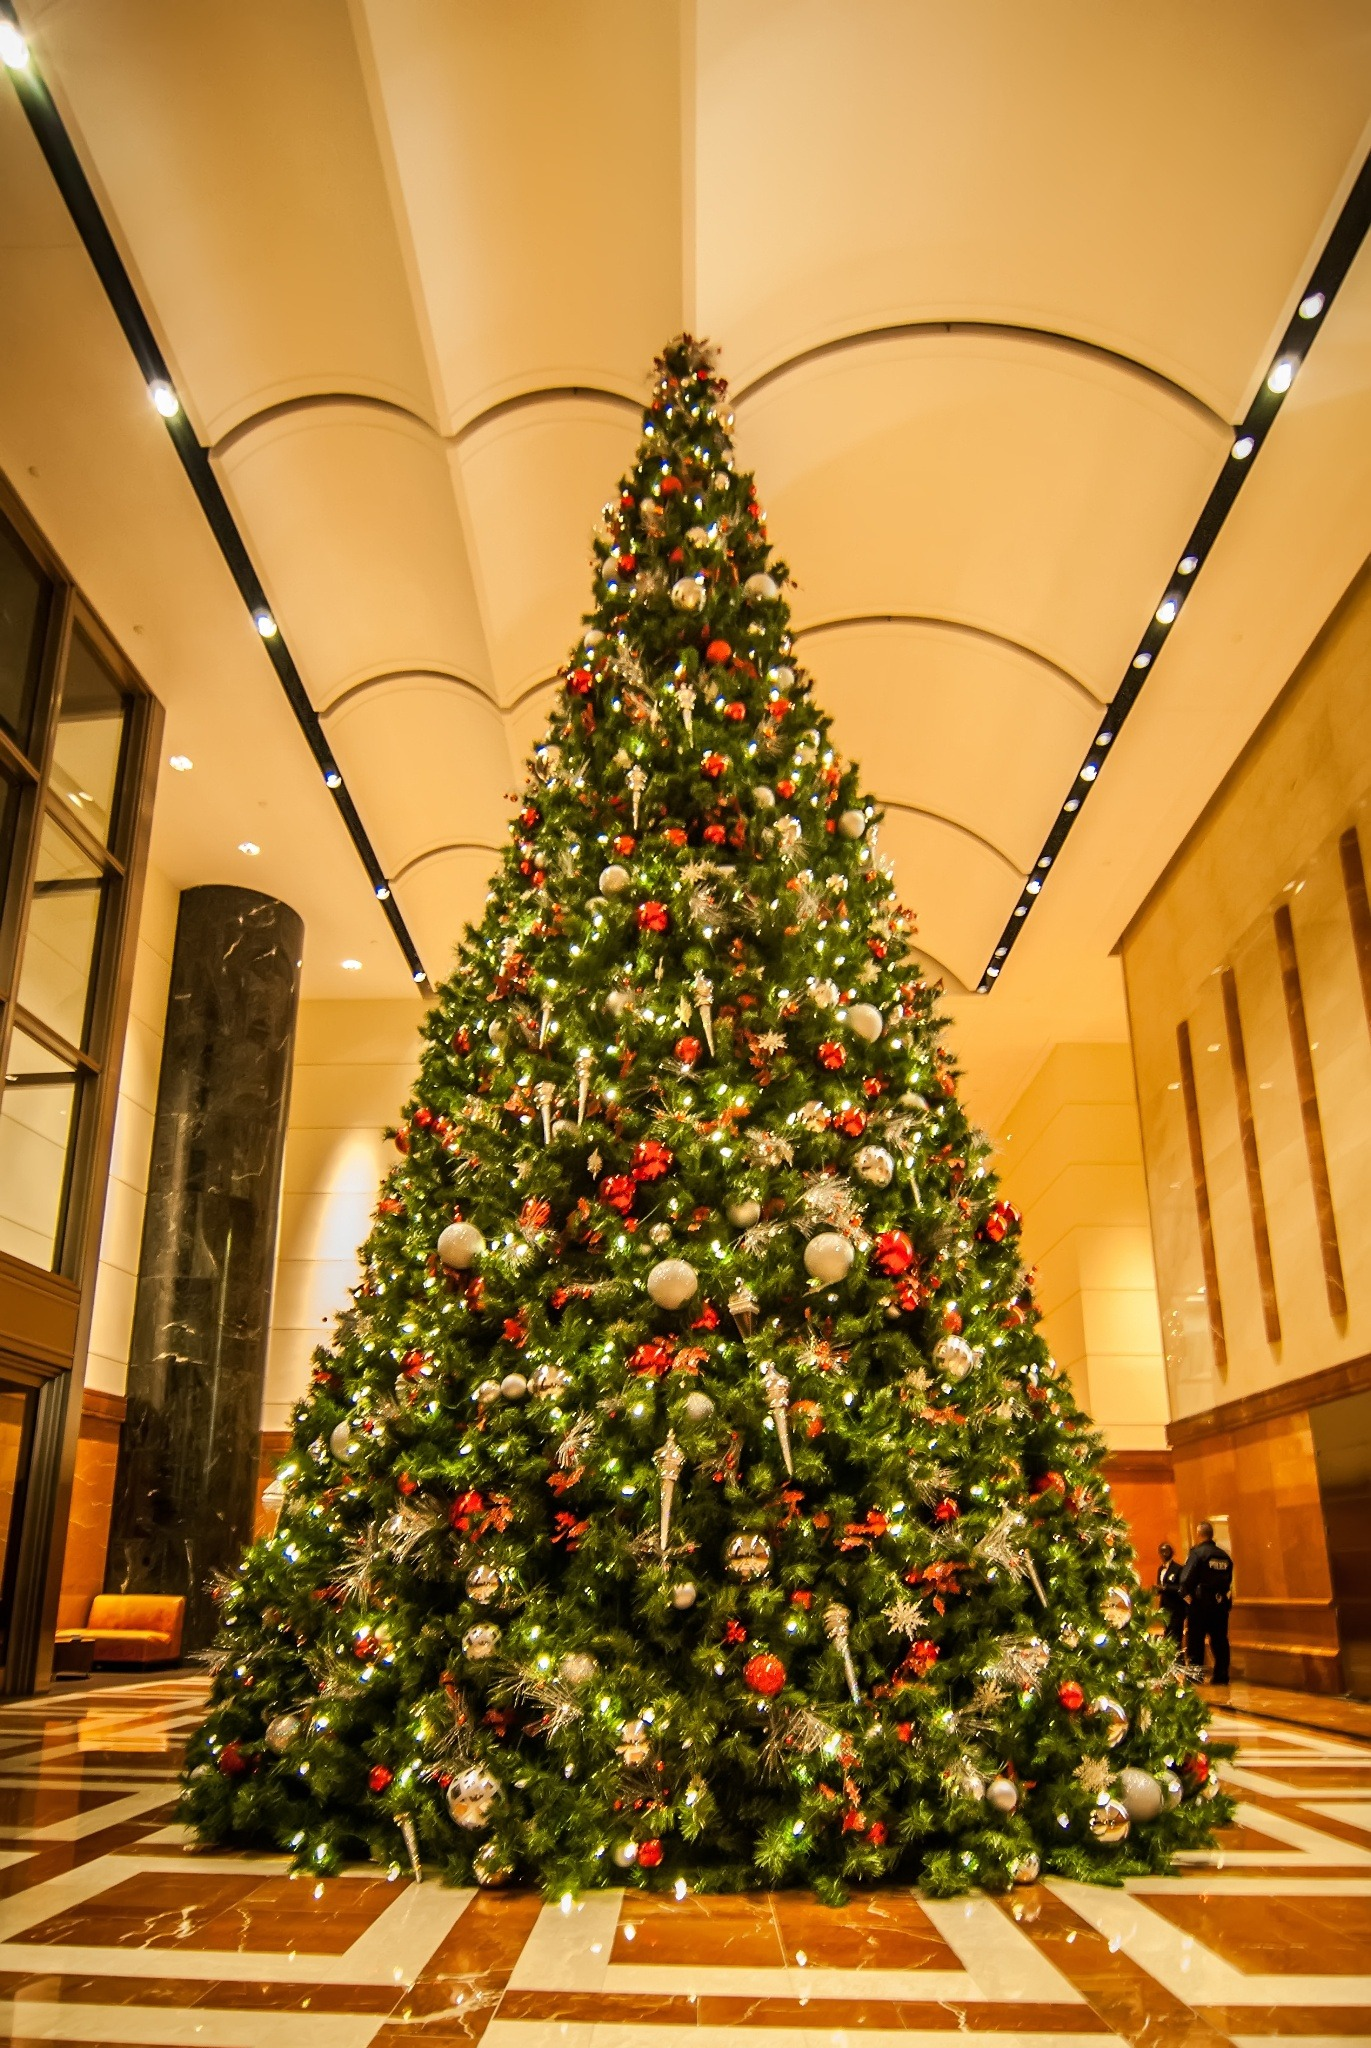 Festively Decorated Christmas Trees Blog